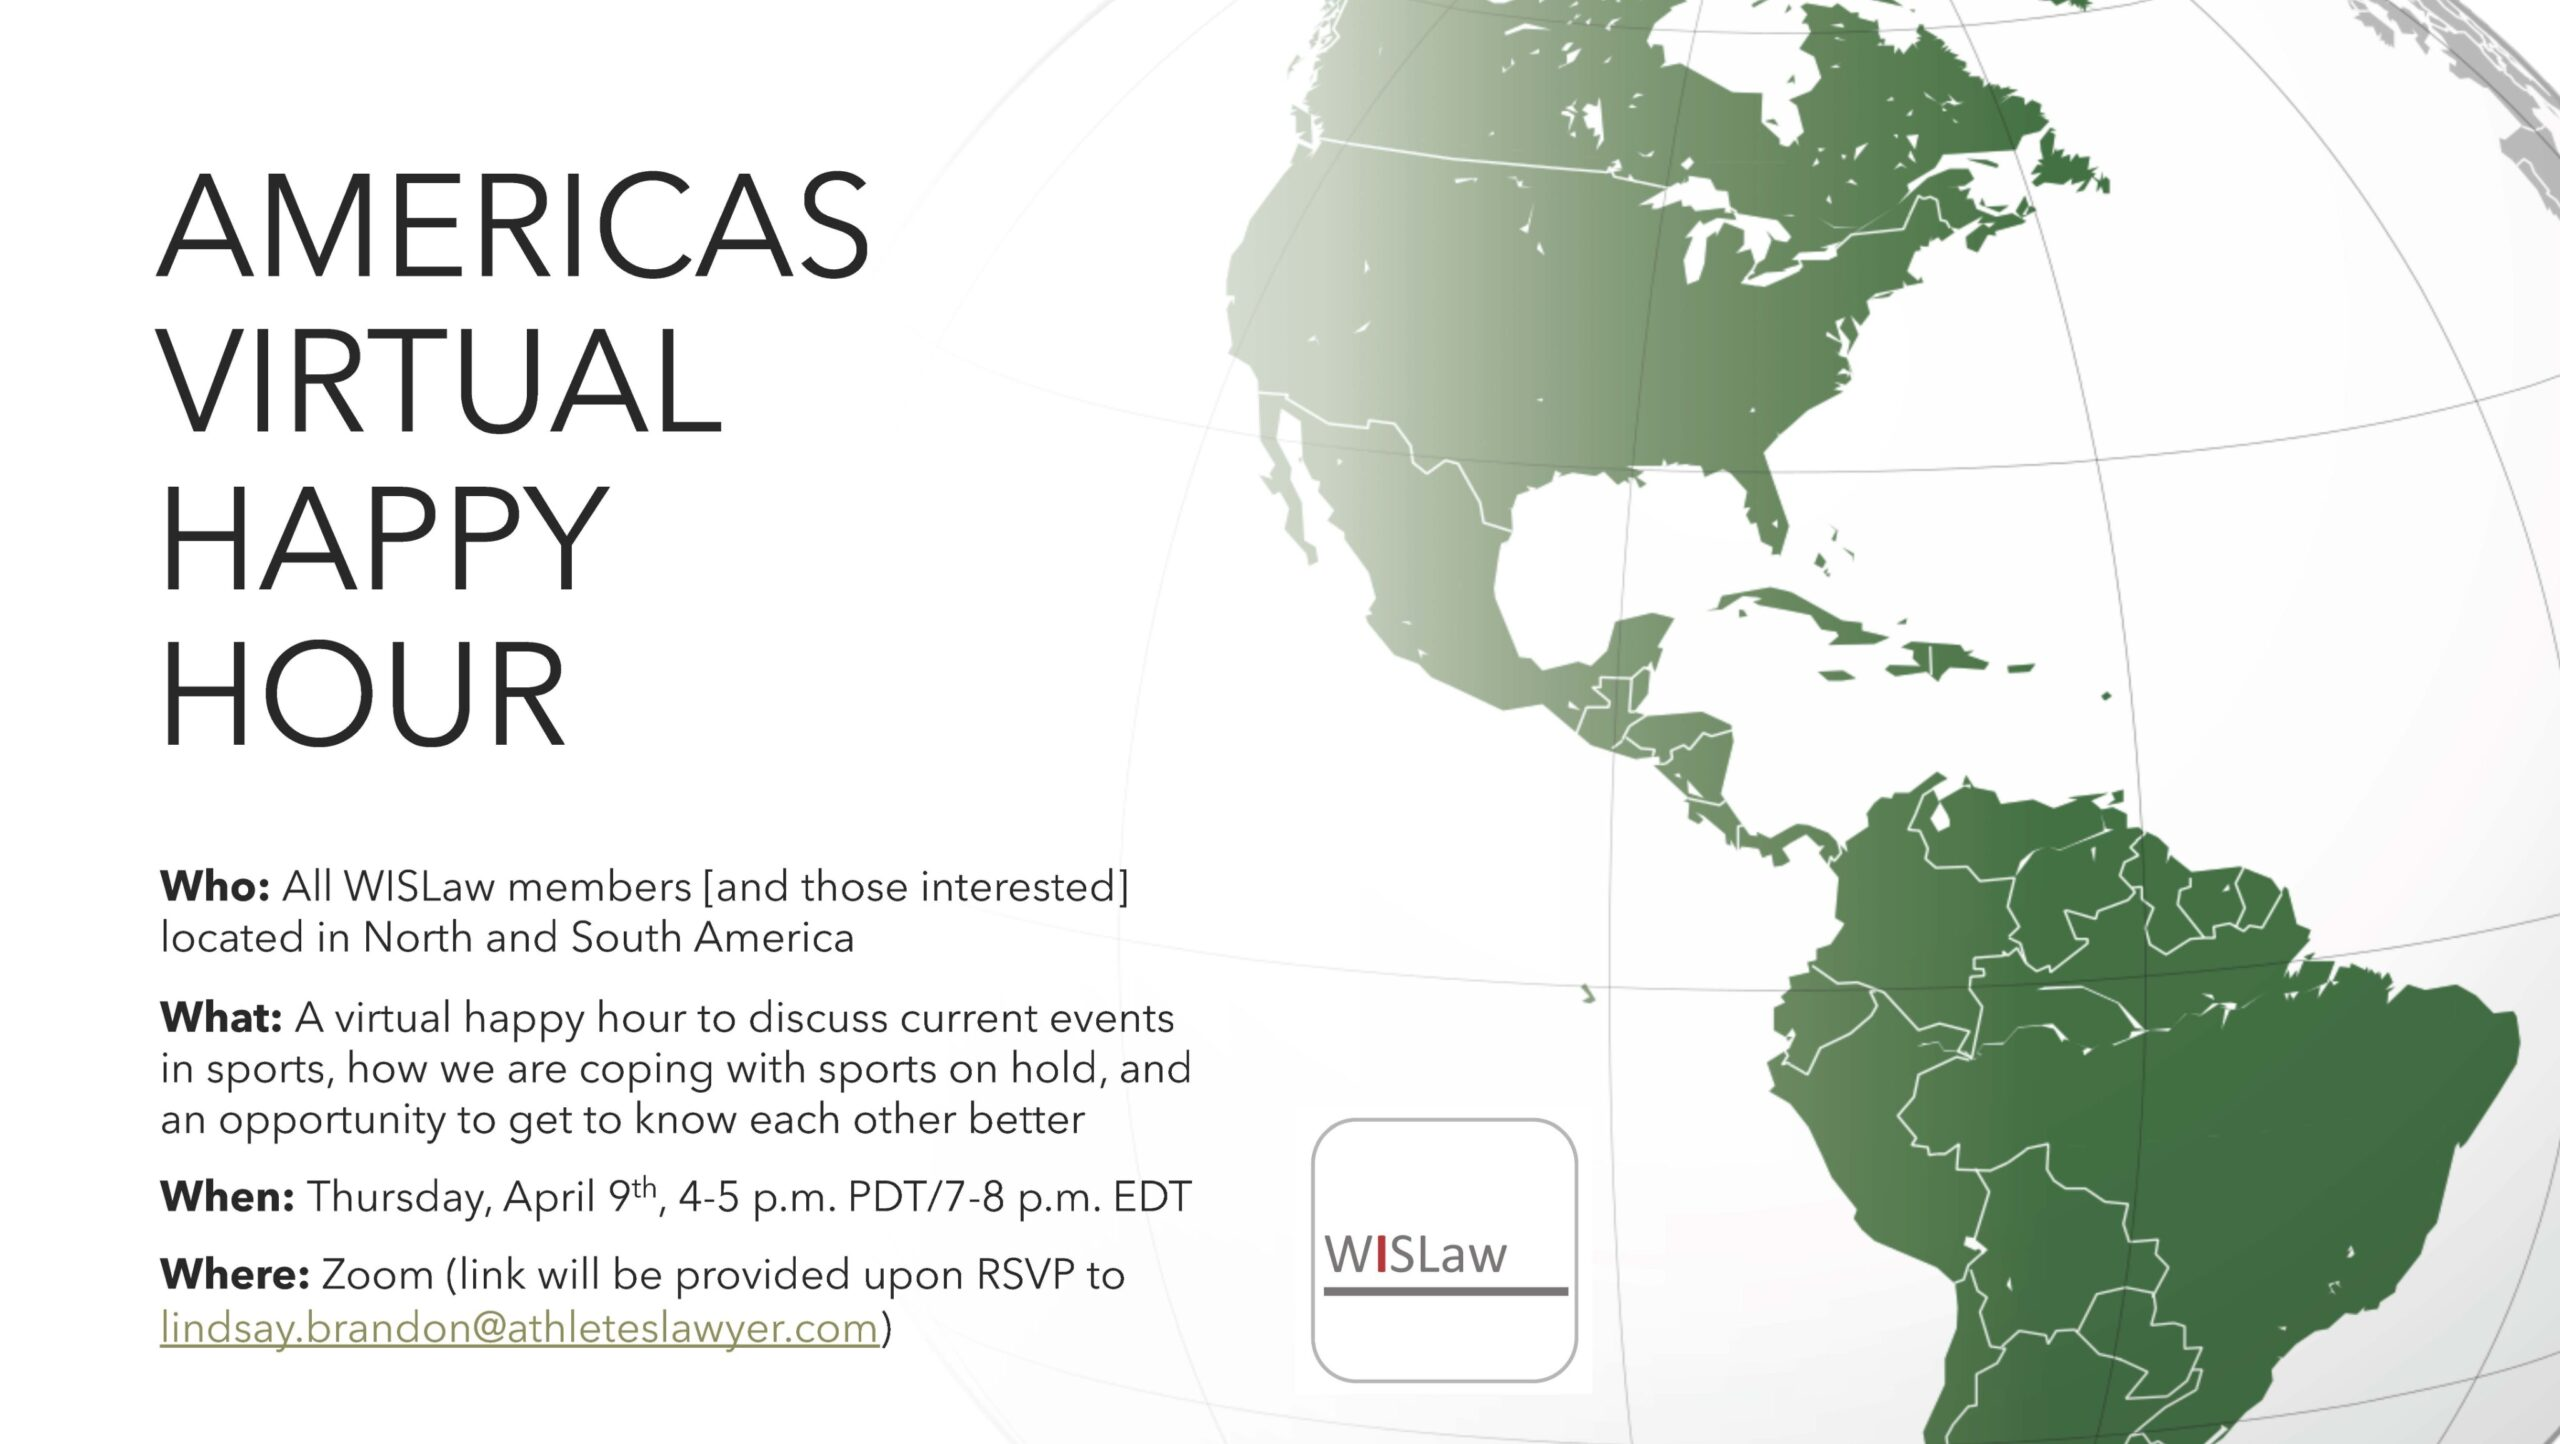 Americas Virtual Happy Hour - 9 April 2020